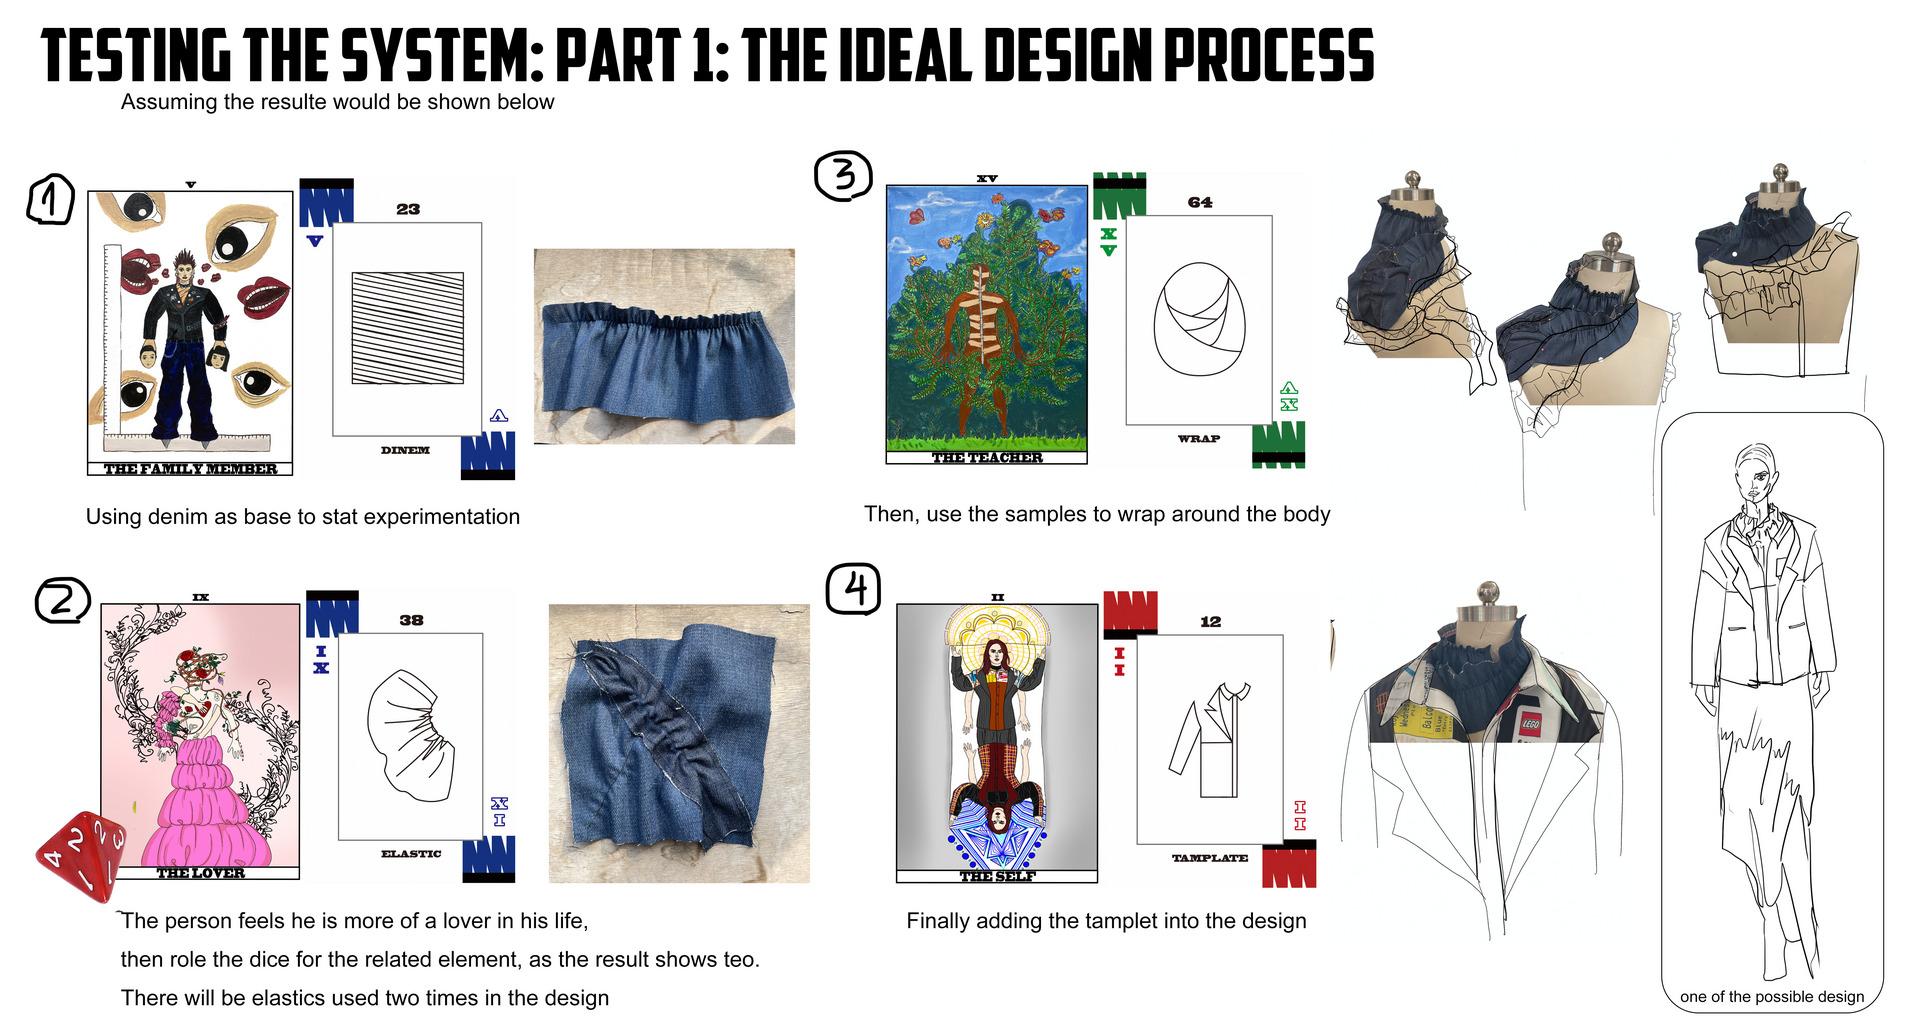 The Ideal Design Process